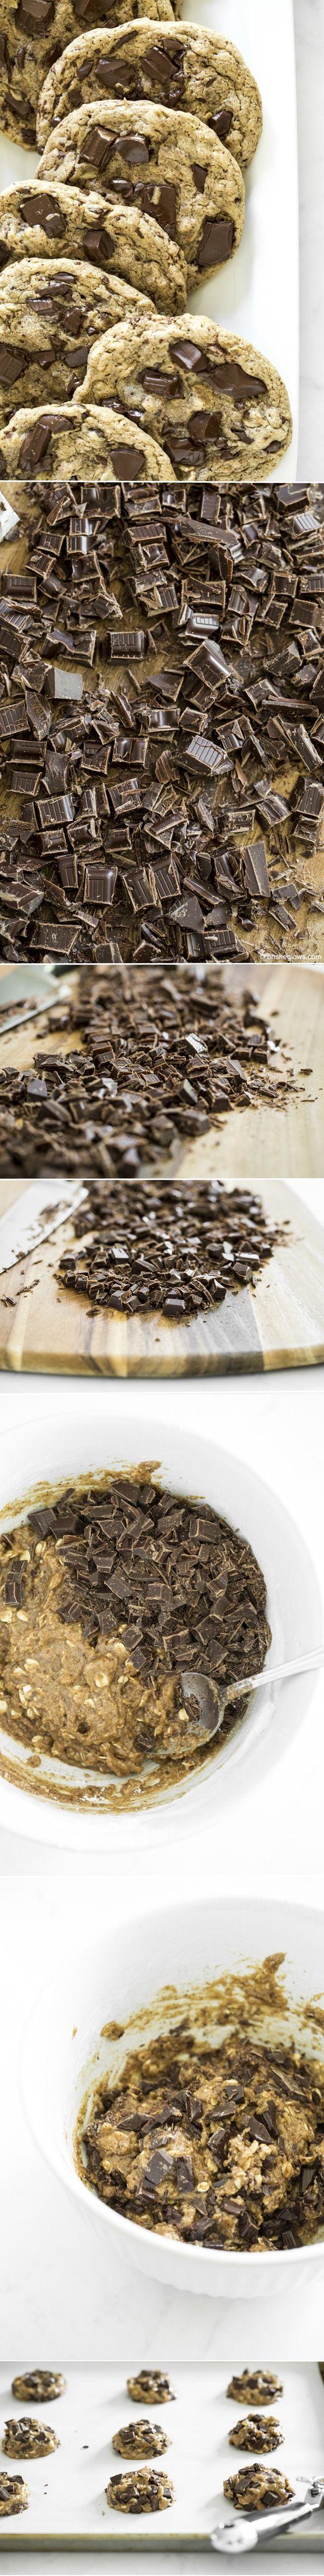 One Bowl Jumbo Chocolate Chunk Cookies (vegan + gf) — Taste like nutty-oatmeal cookies. So good!